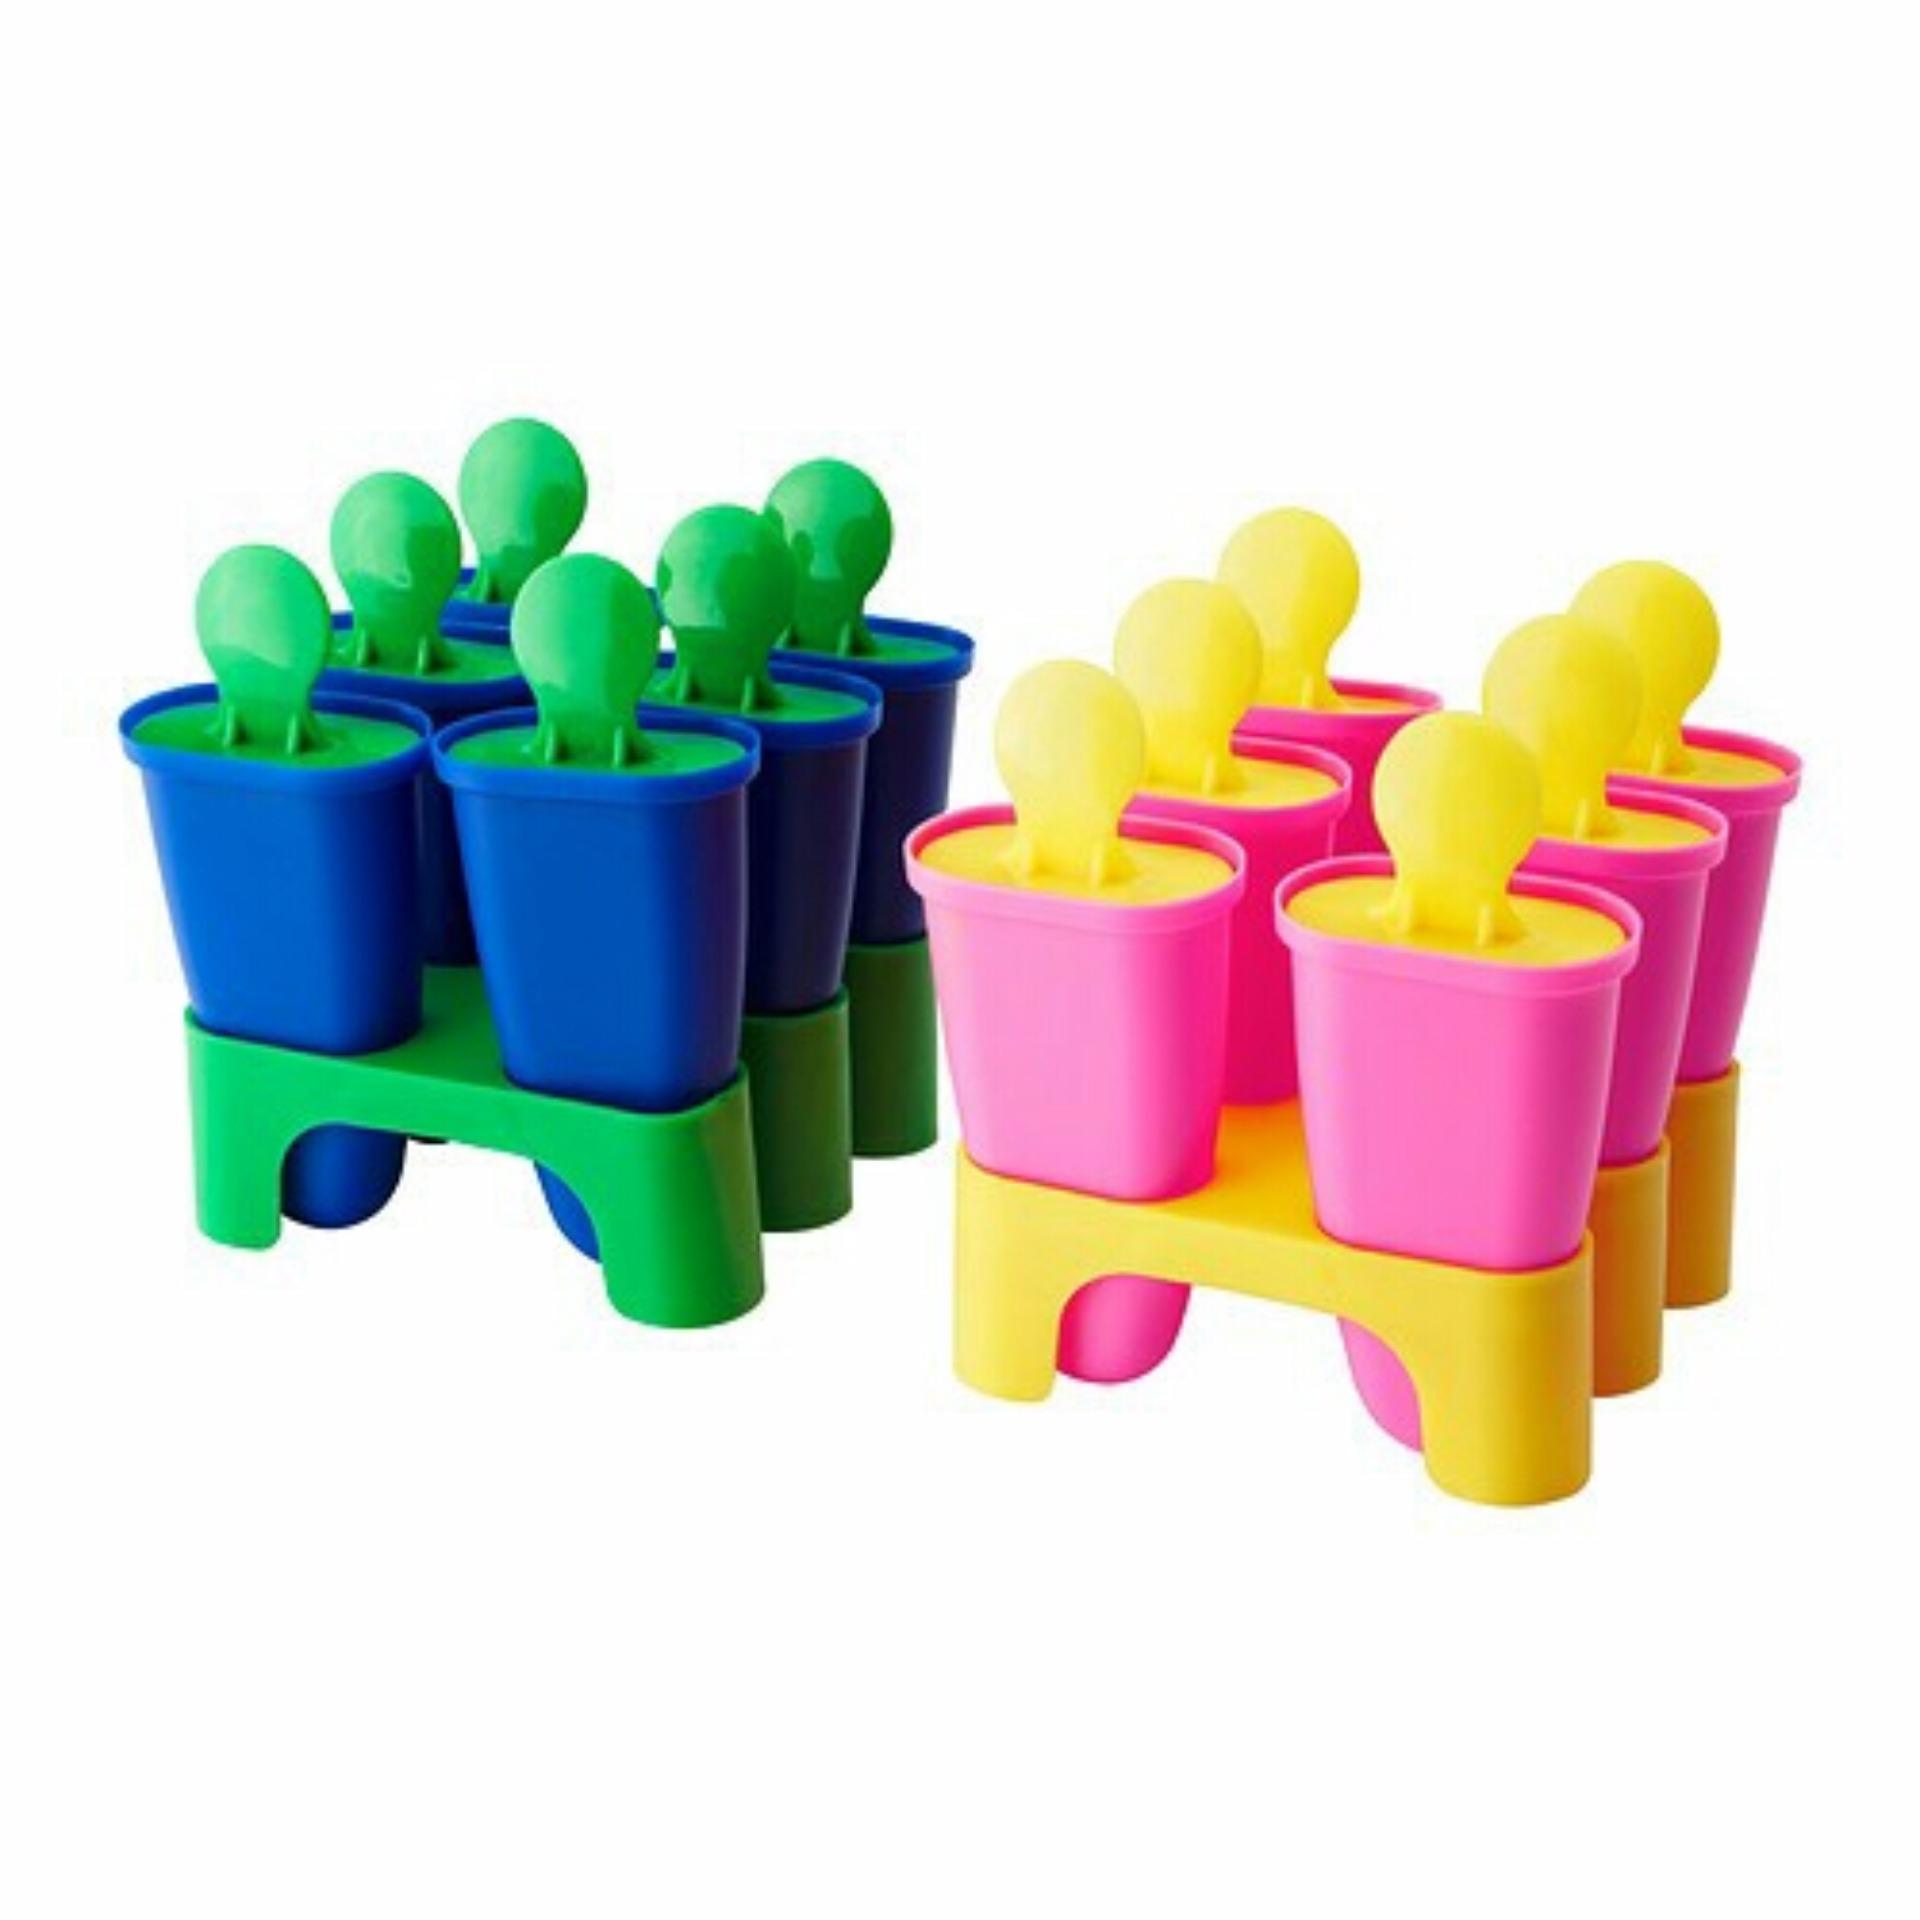 IKEA Chosigt Cetakan Es loly - ice Lolly Maker Cetakan Es Krim - es loli buah